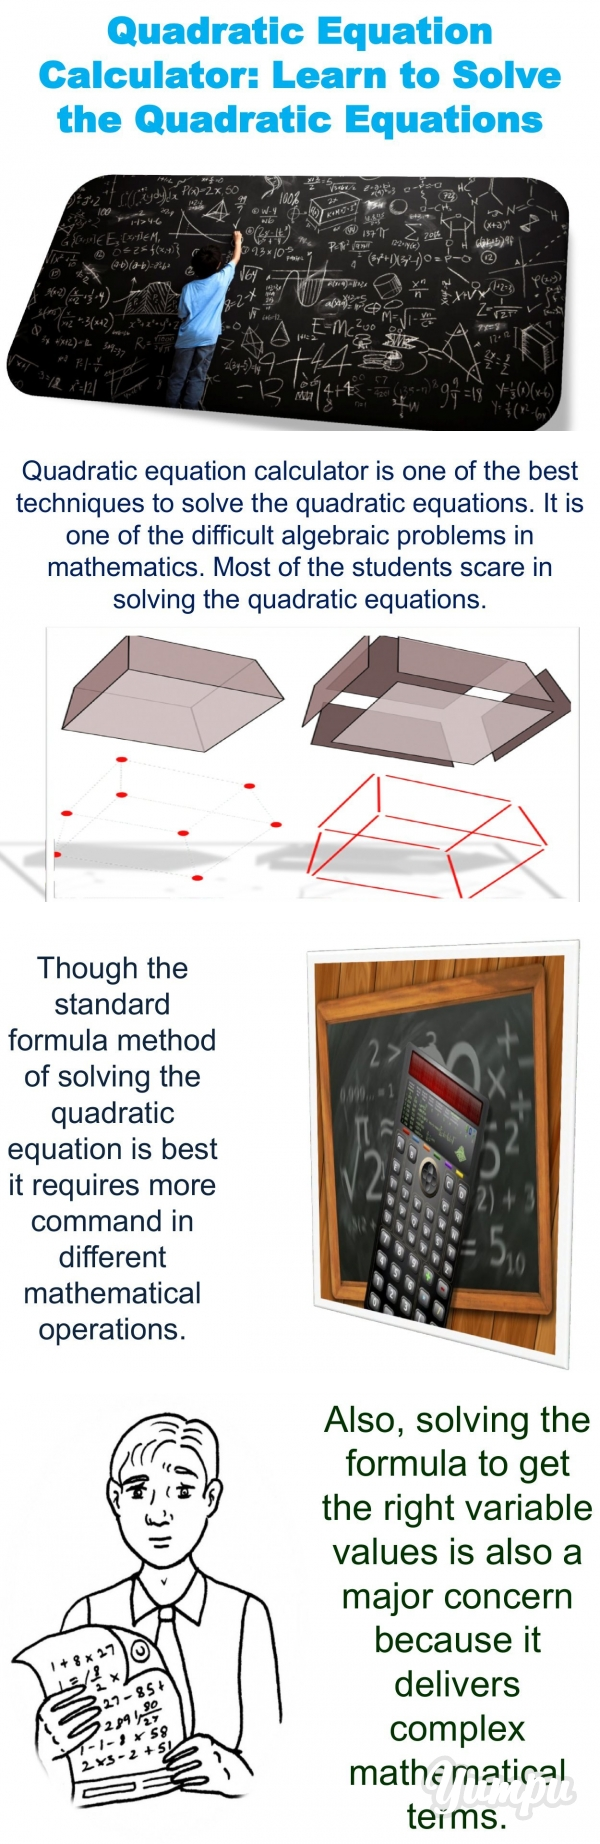 Quadratic Equation Calculator - Learn to Solve the Quadratic ...